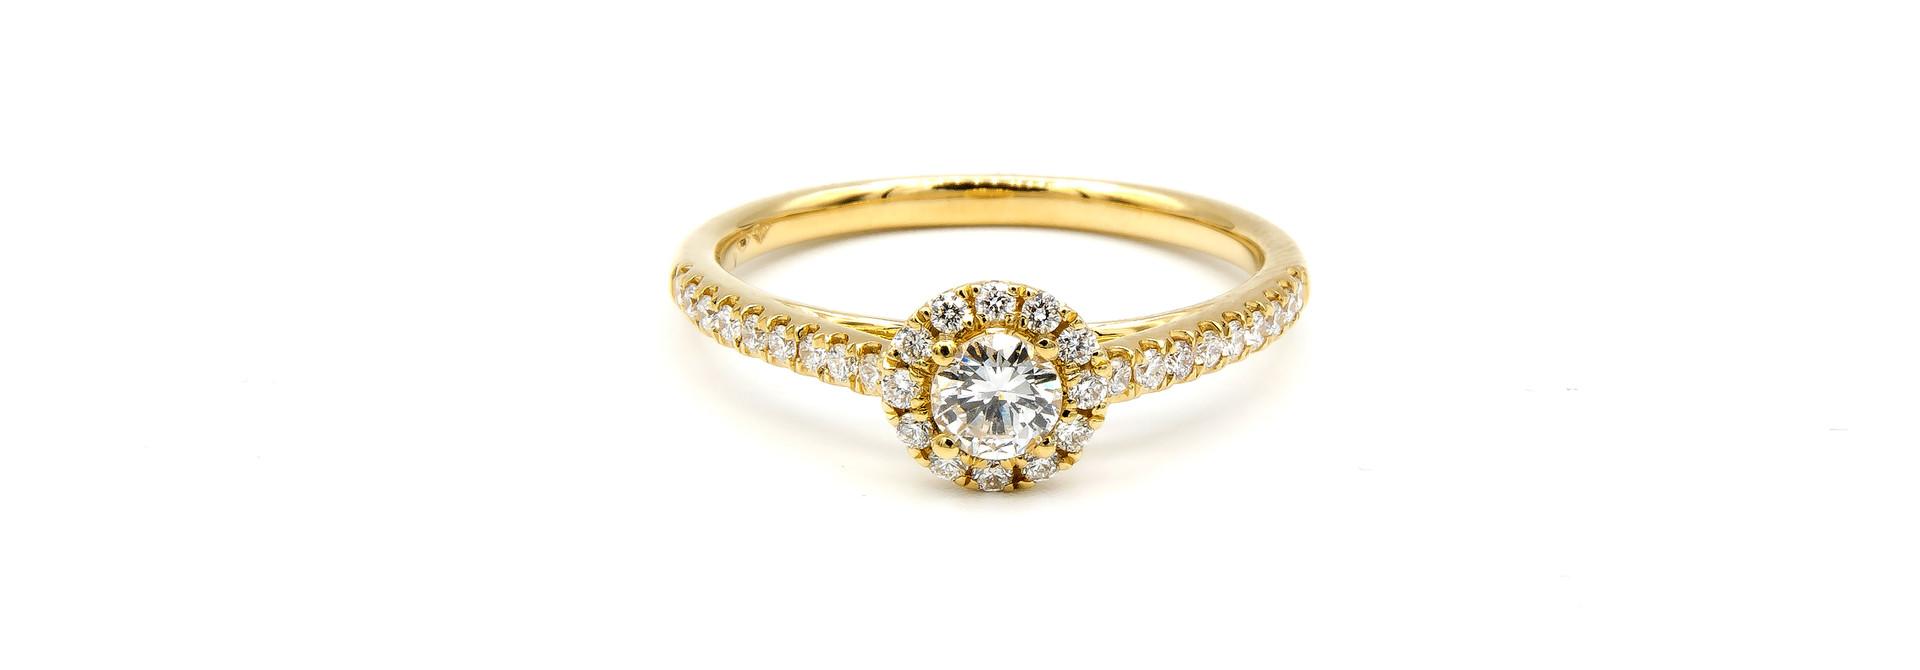 Ring verlovingsring met 0,3 ct VS en 0,26 ct VS diamant